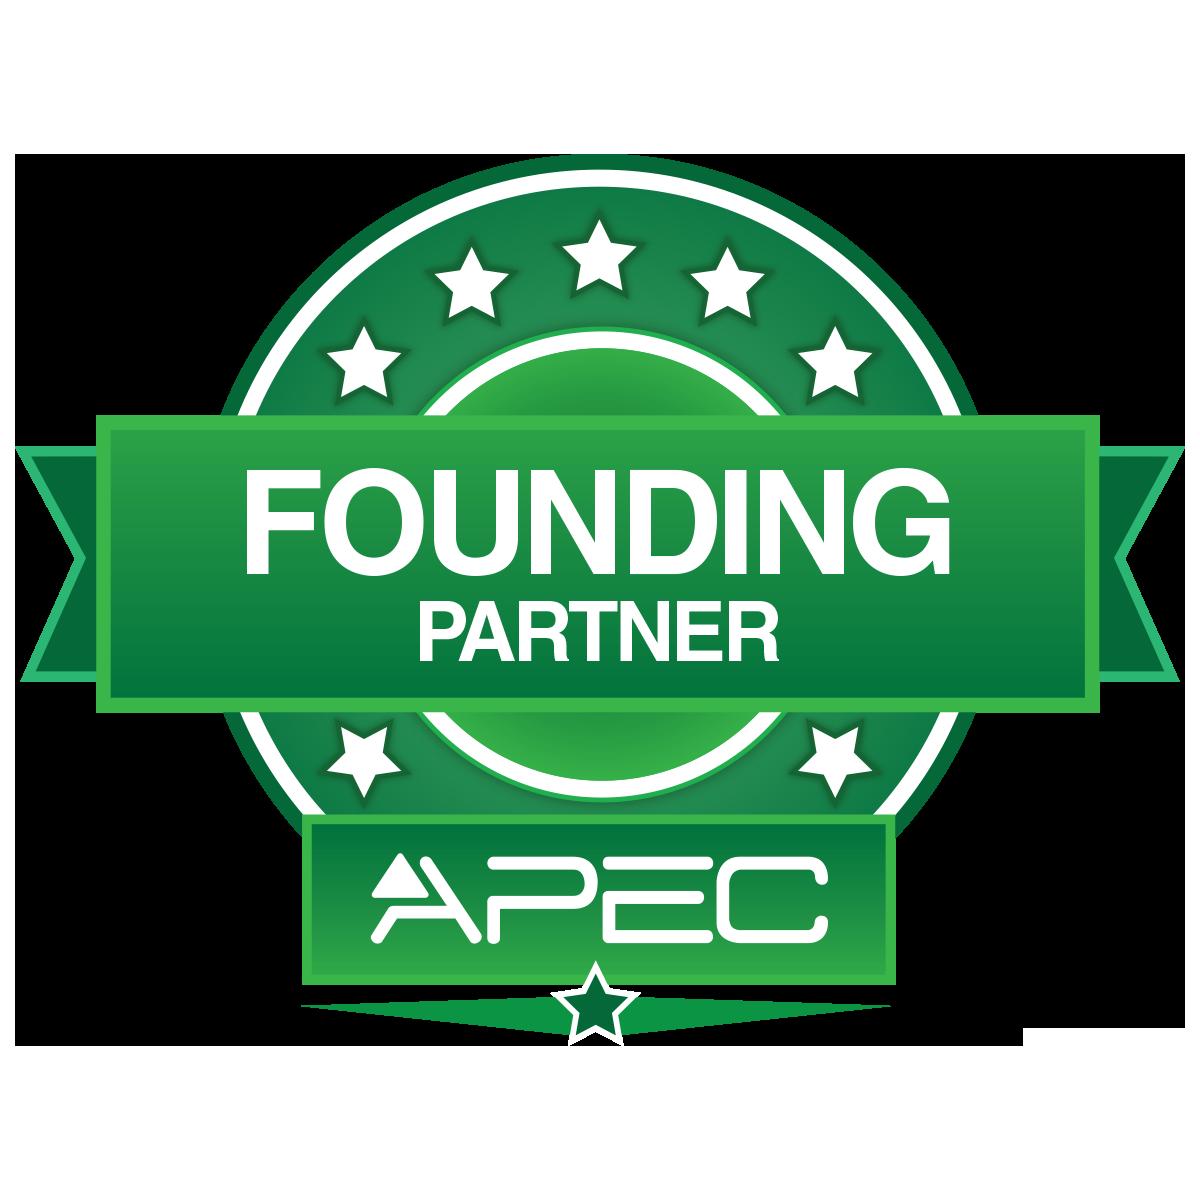 APEC Founding Partner Badge